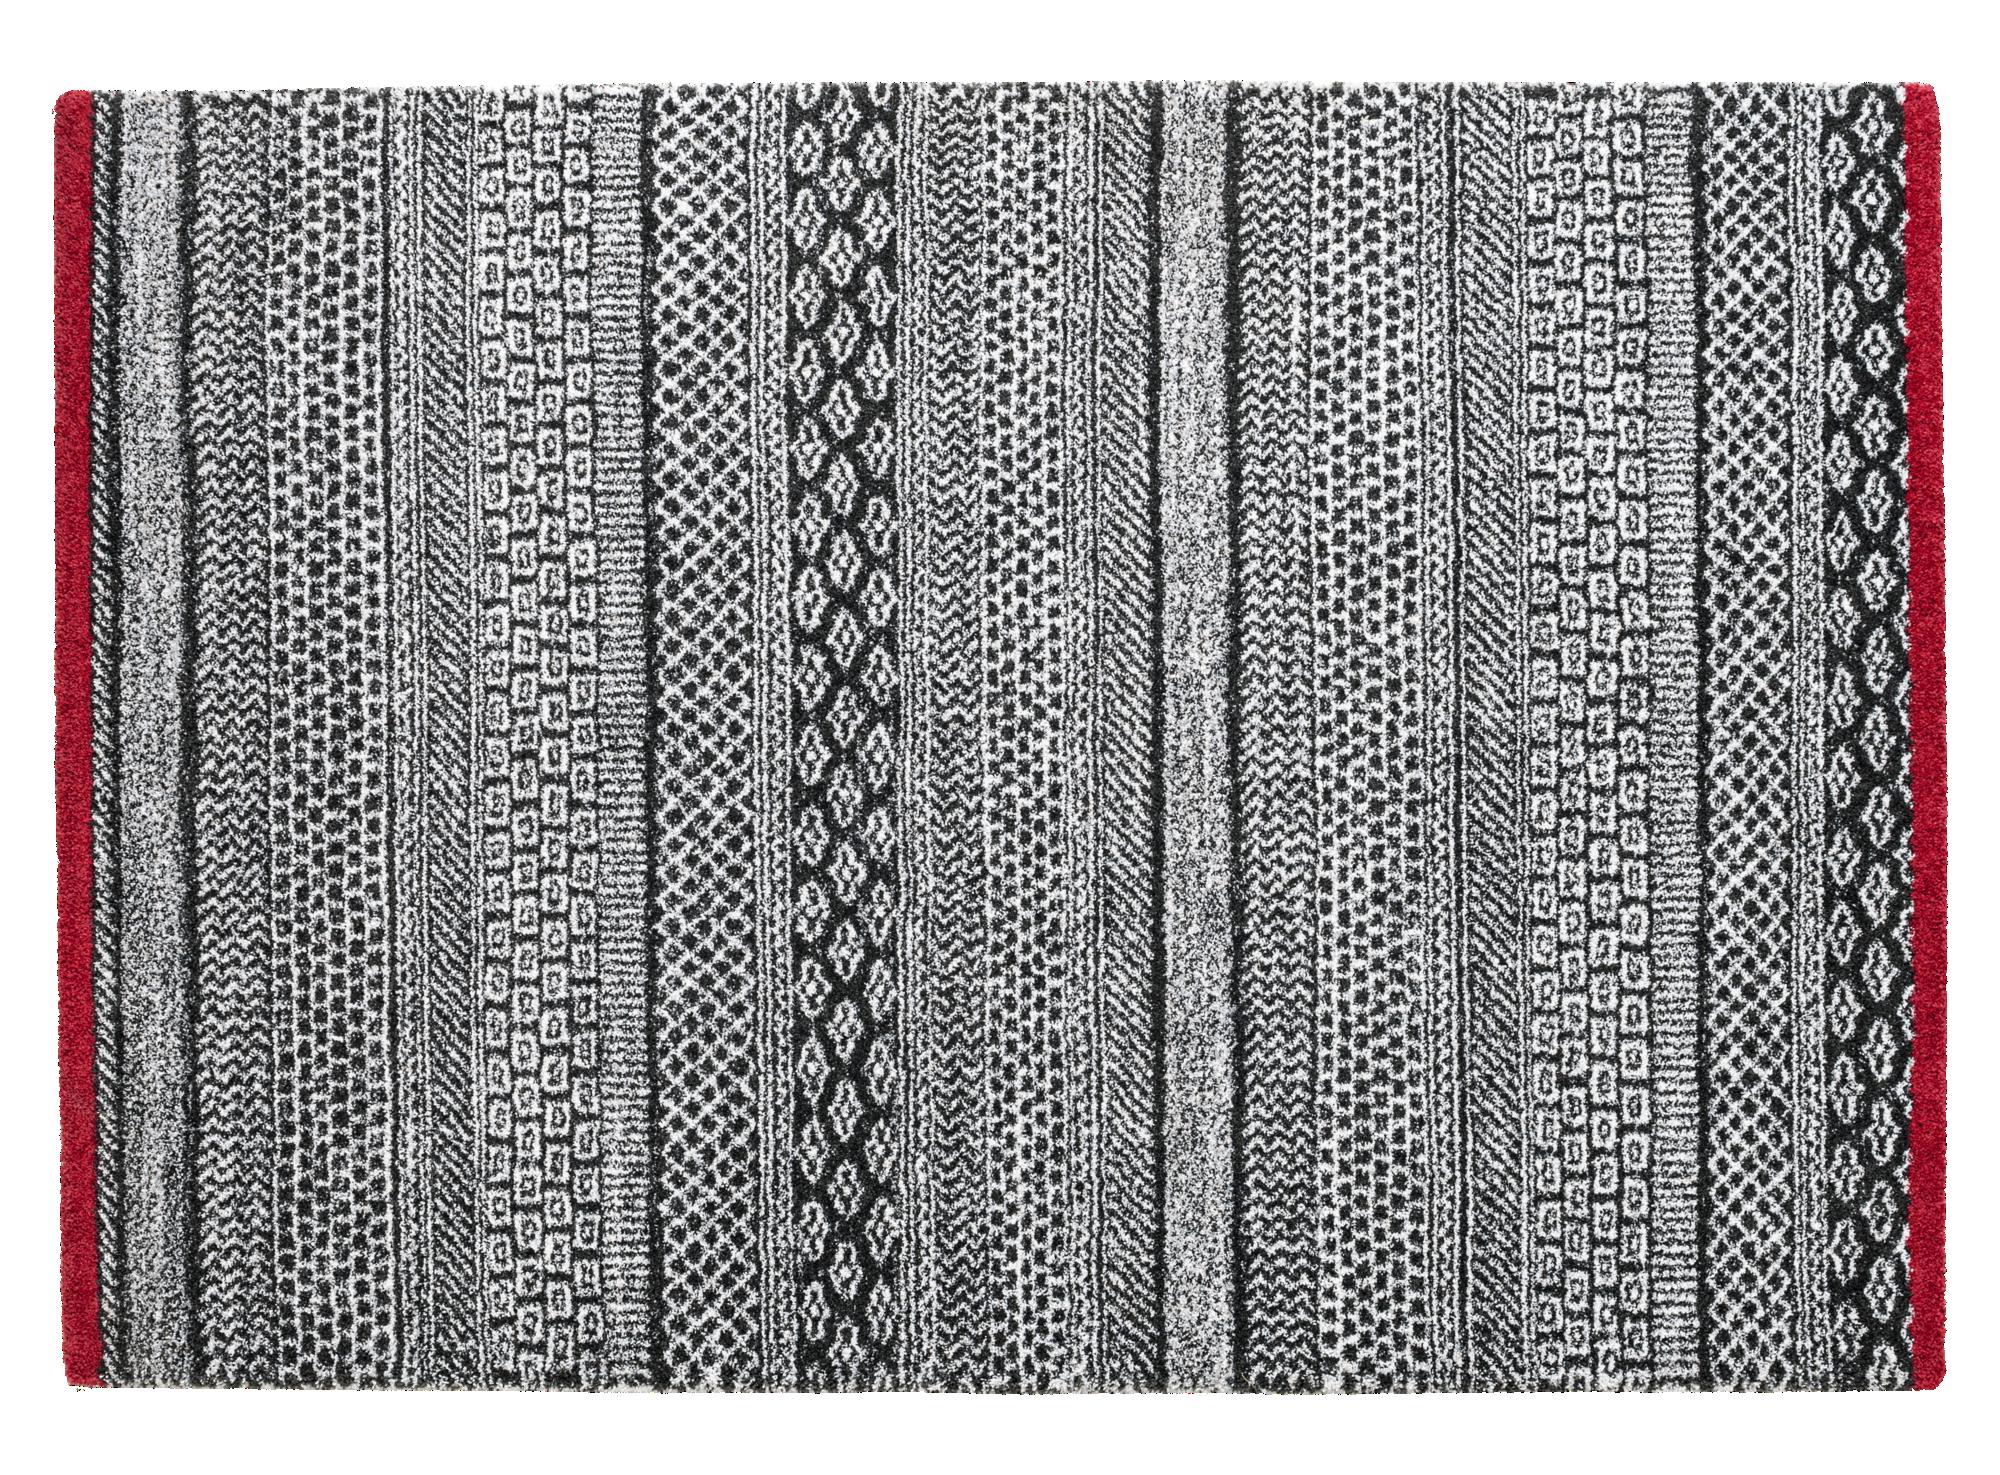 Tapis 160x230 100% polypropylene coloris antracite/gris clair densite ...